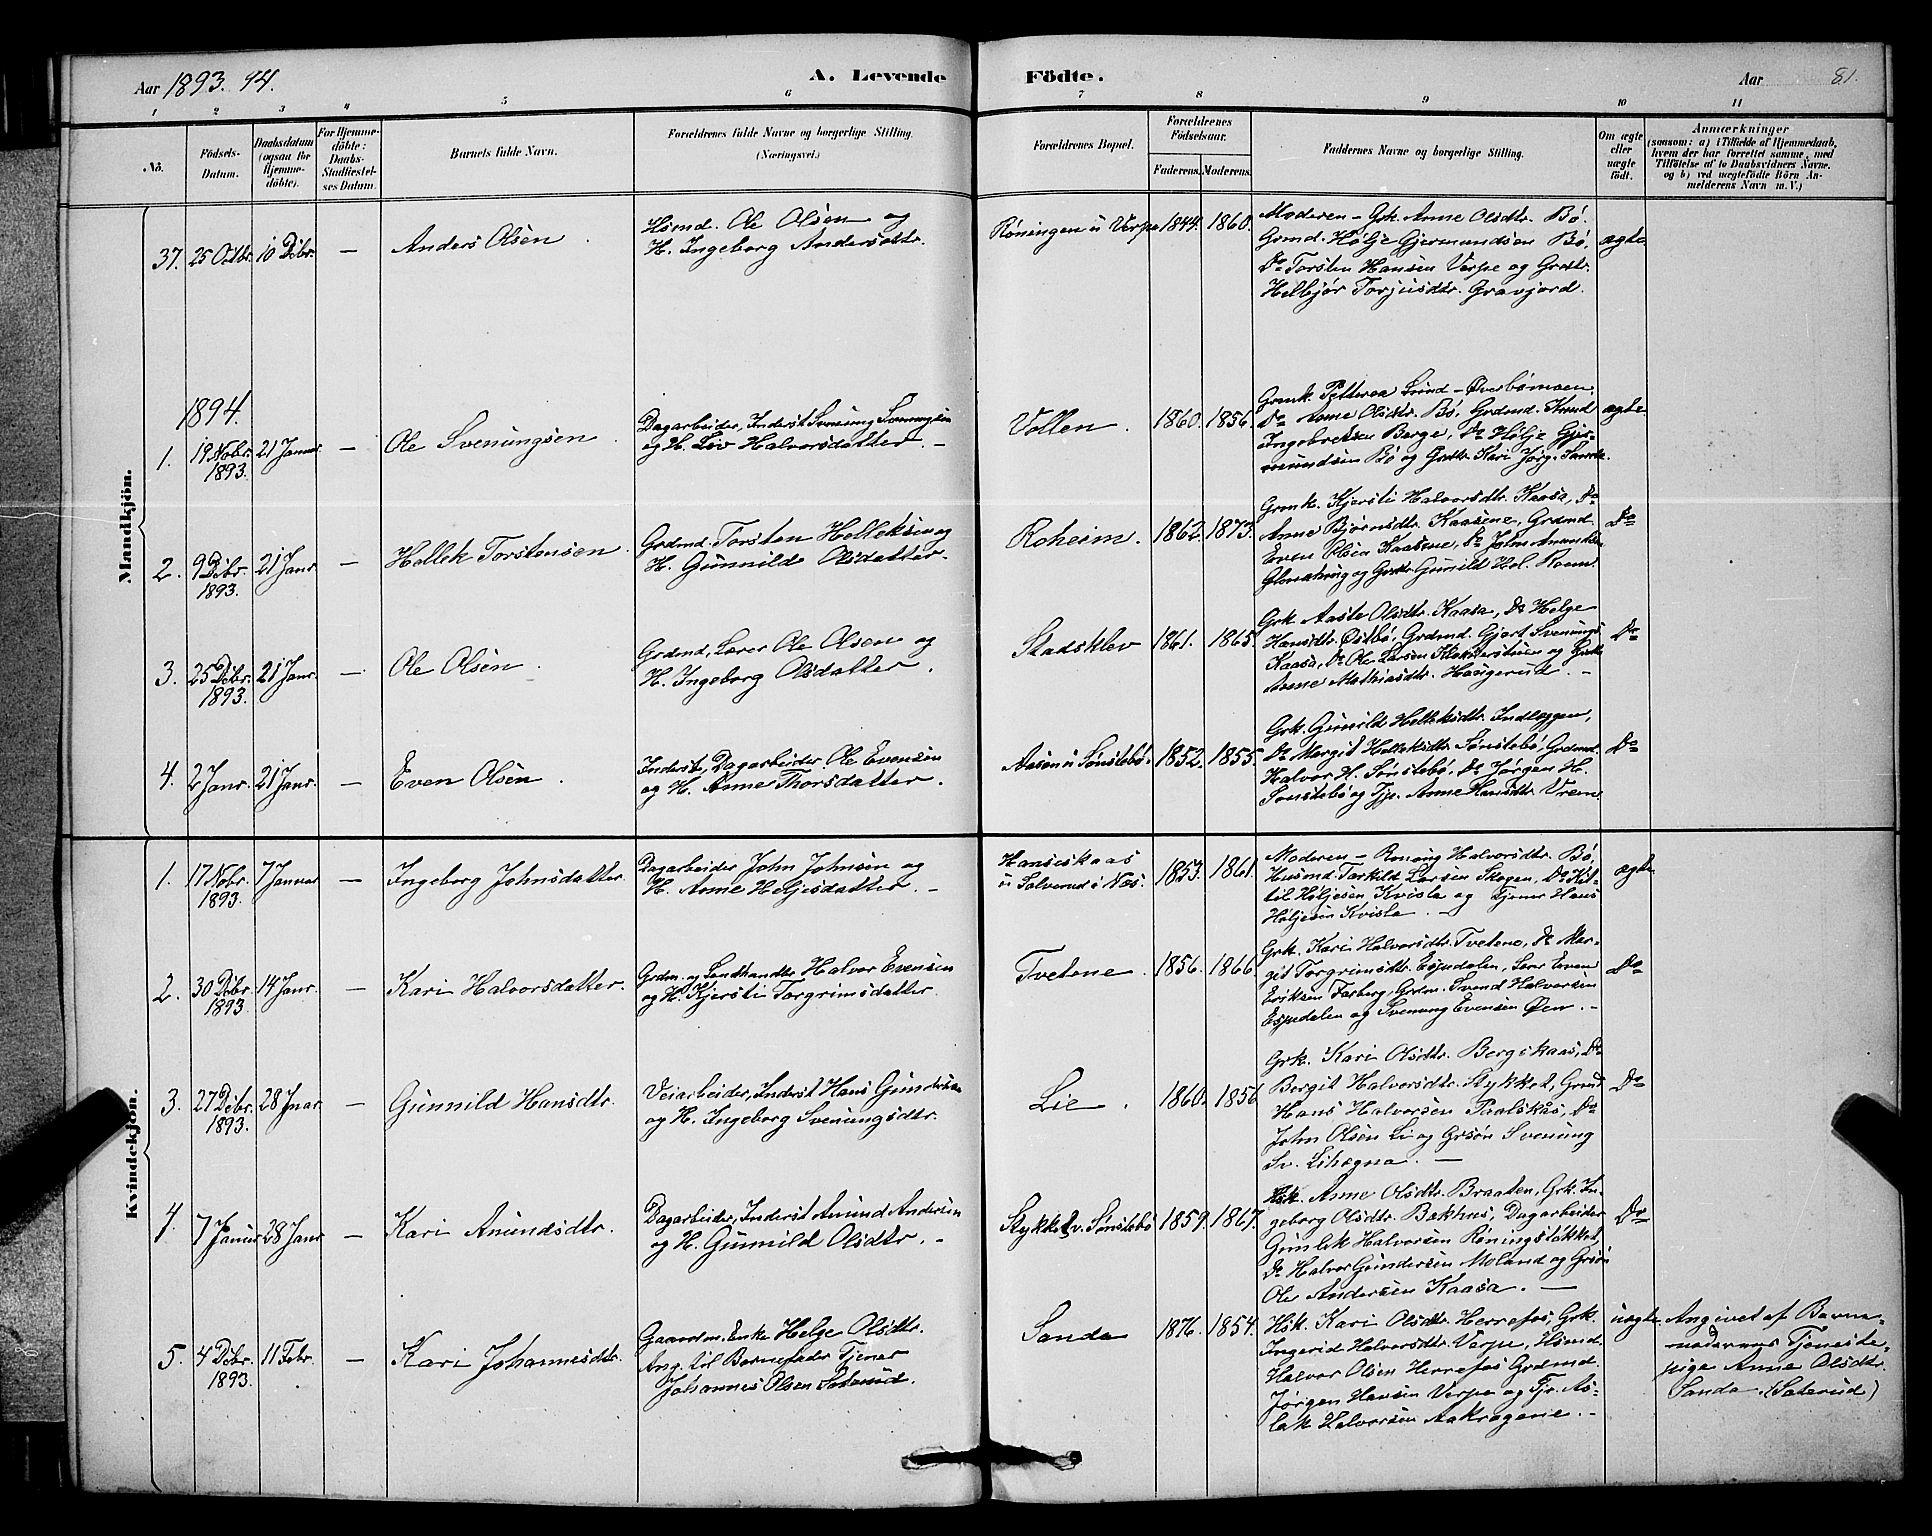 SAKO, Bø kirkebøker, G/Ga/L0005: Klokkerbok nr. 5, 1883-1897, s. 81